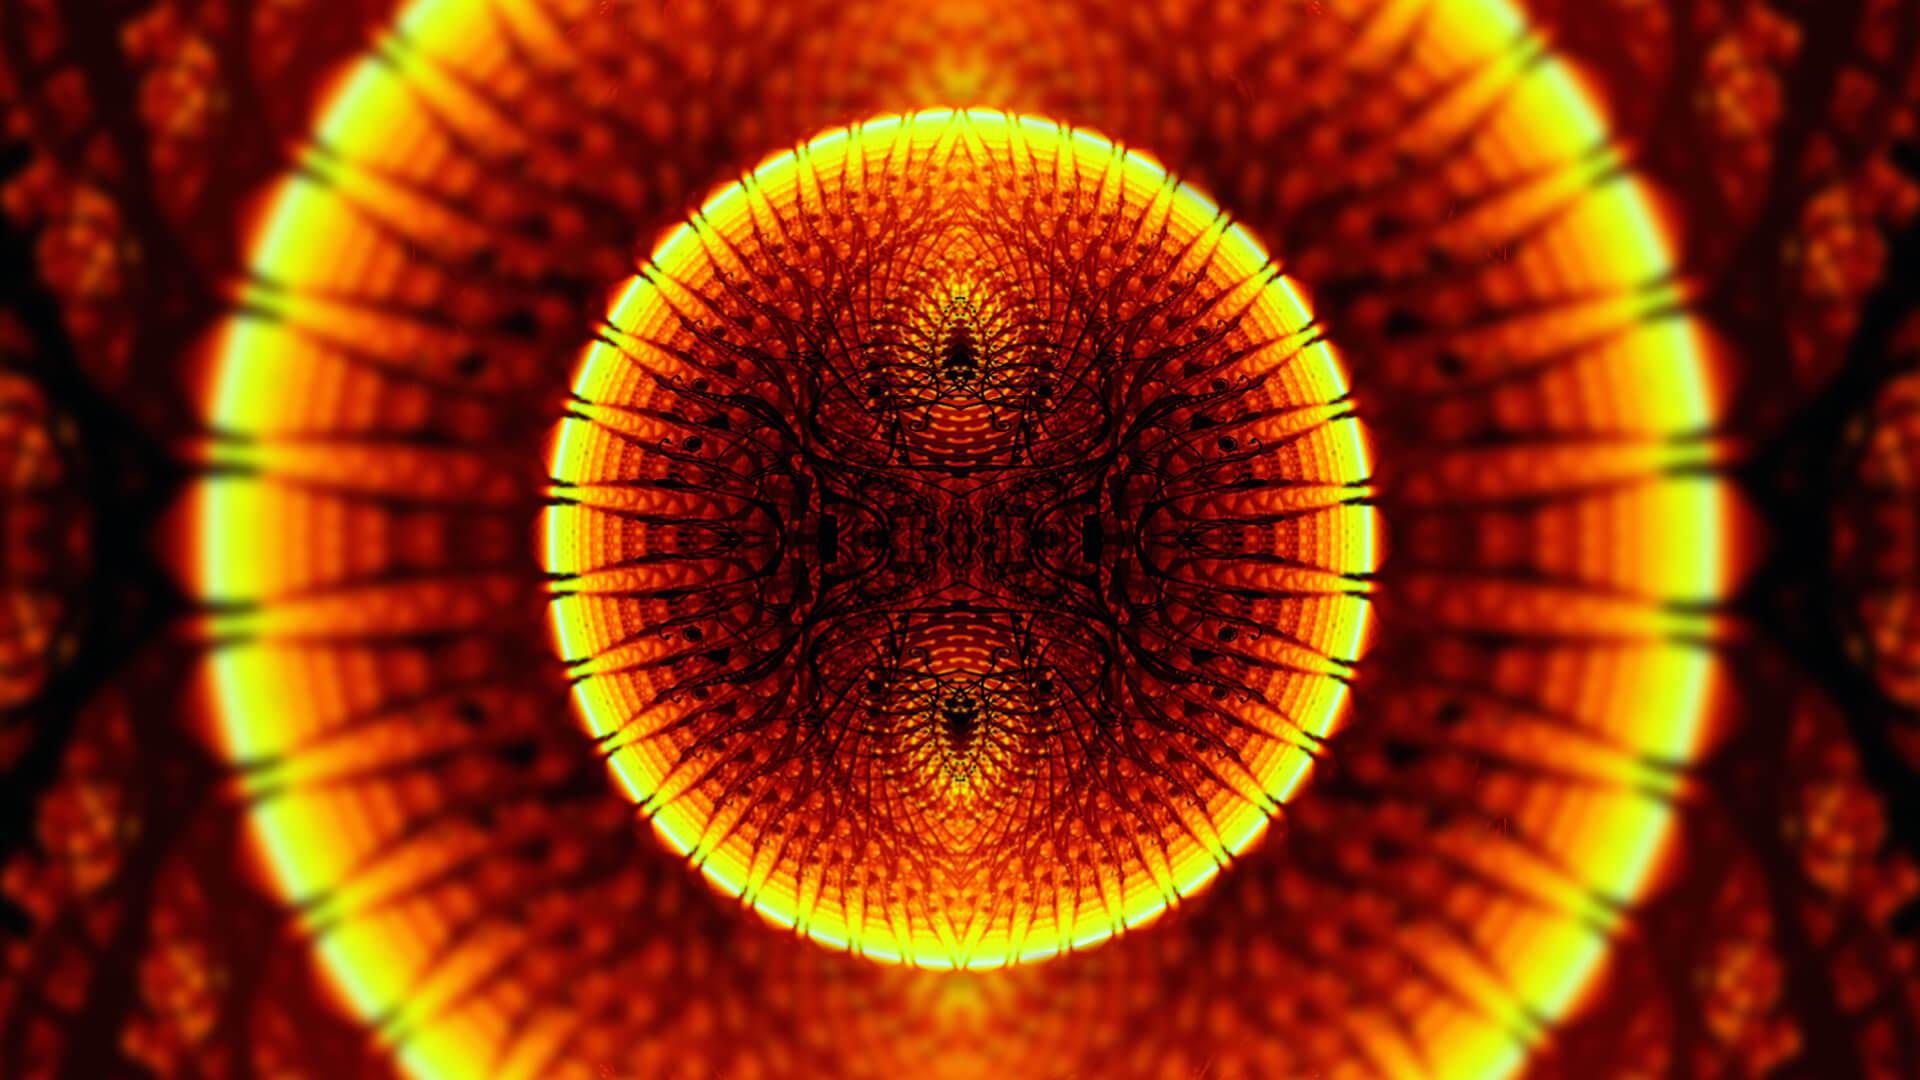 The star - digital abstract art by Mitek